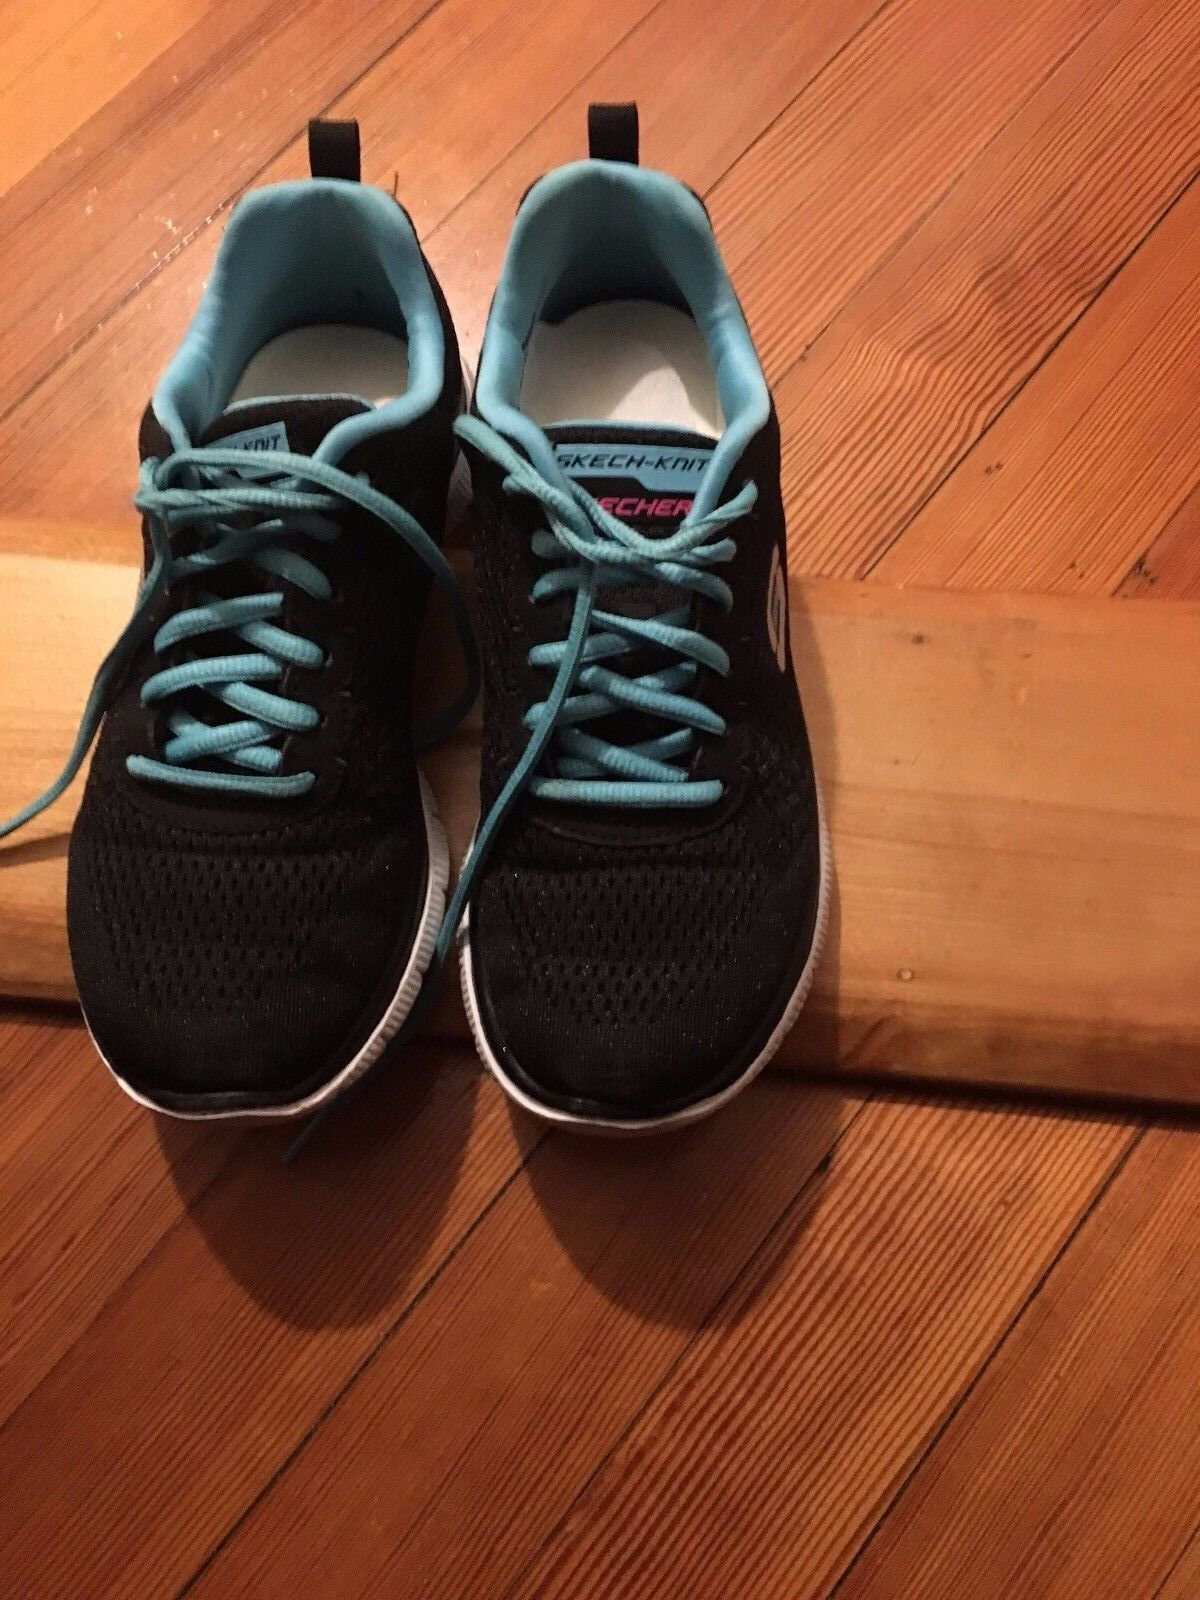 Women's Size Nursing 9.5 Reebok Walking Shoes Nursing Size Duty Non Skid White Comfort Shoes ae6a21